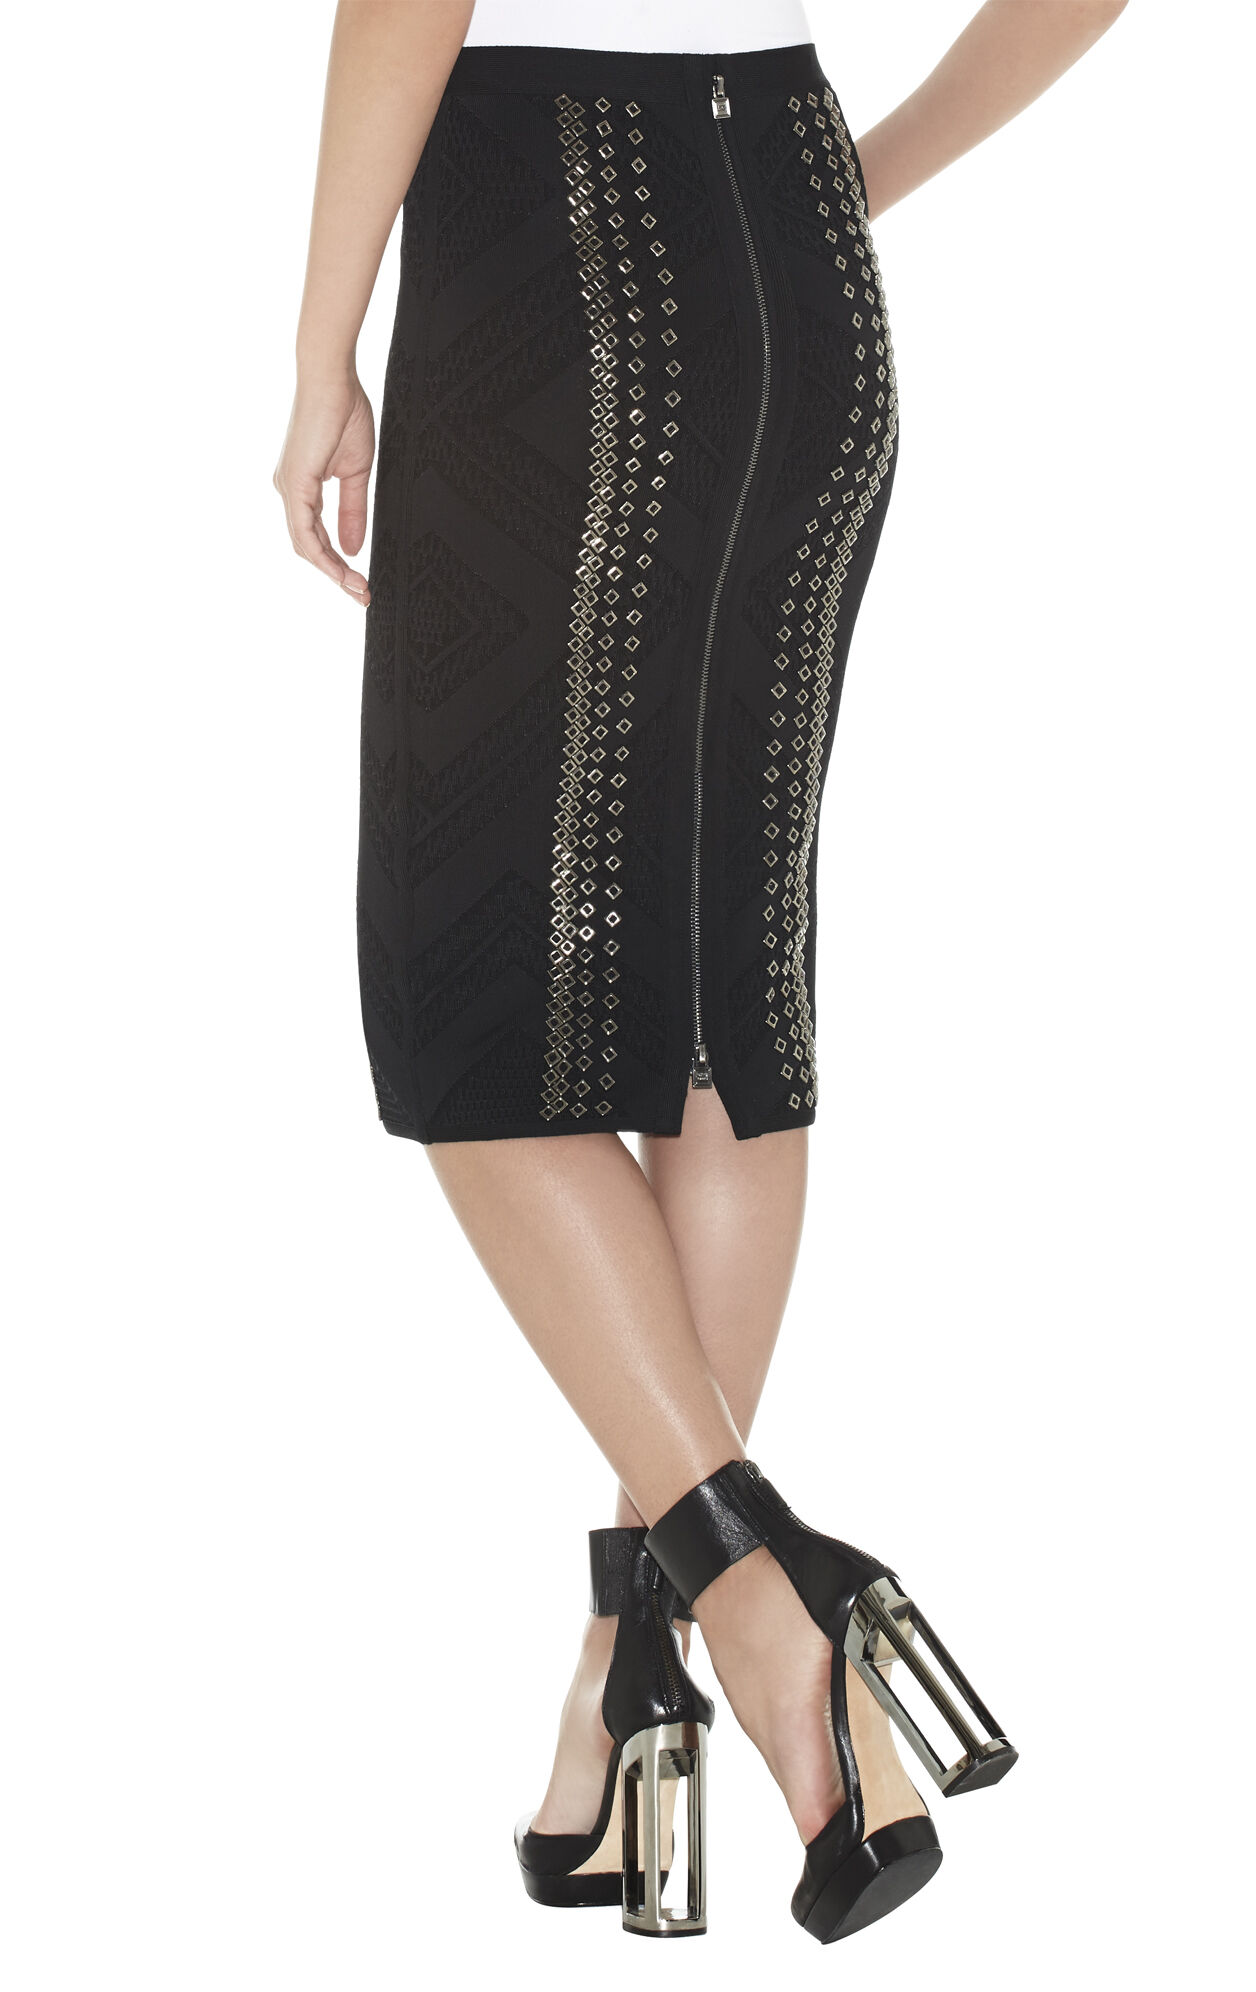 Raven Engineered Textured Beading Skirt